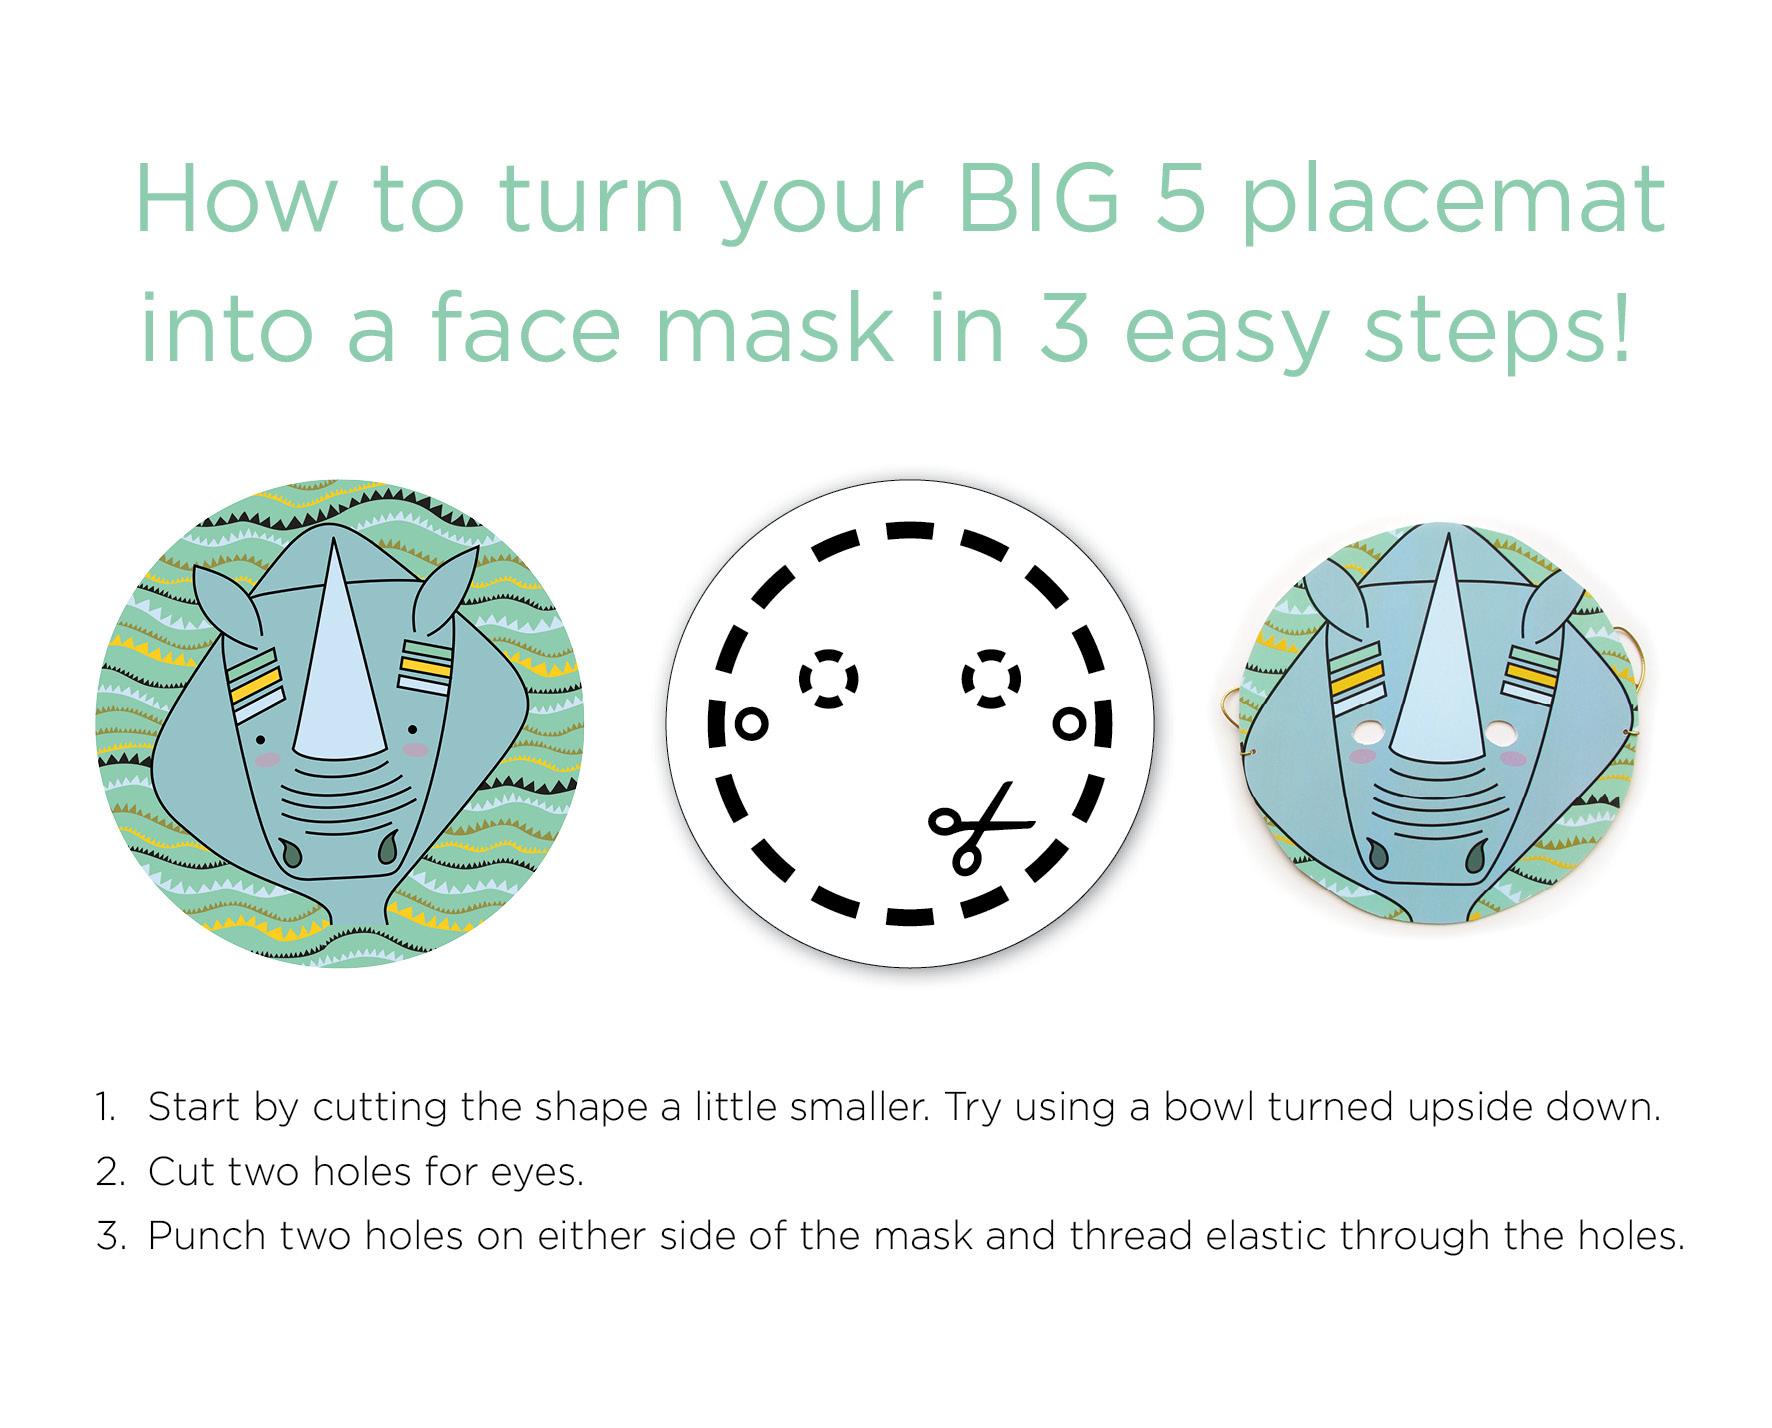 Big5_Placemats_Instructions_Rhino